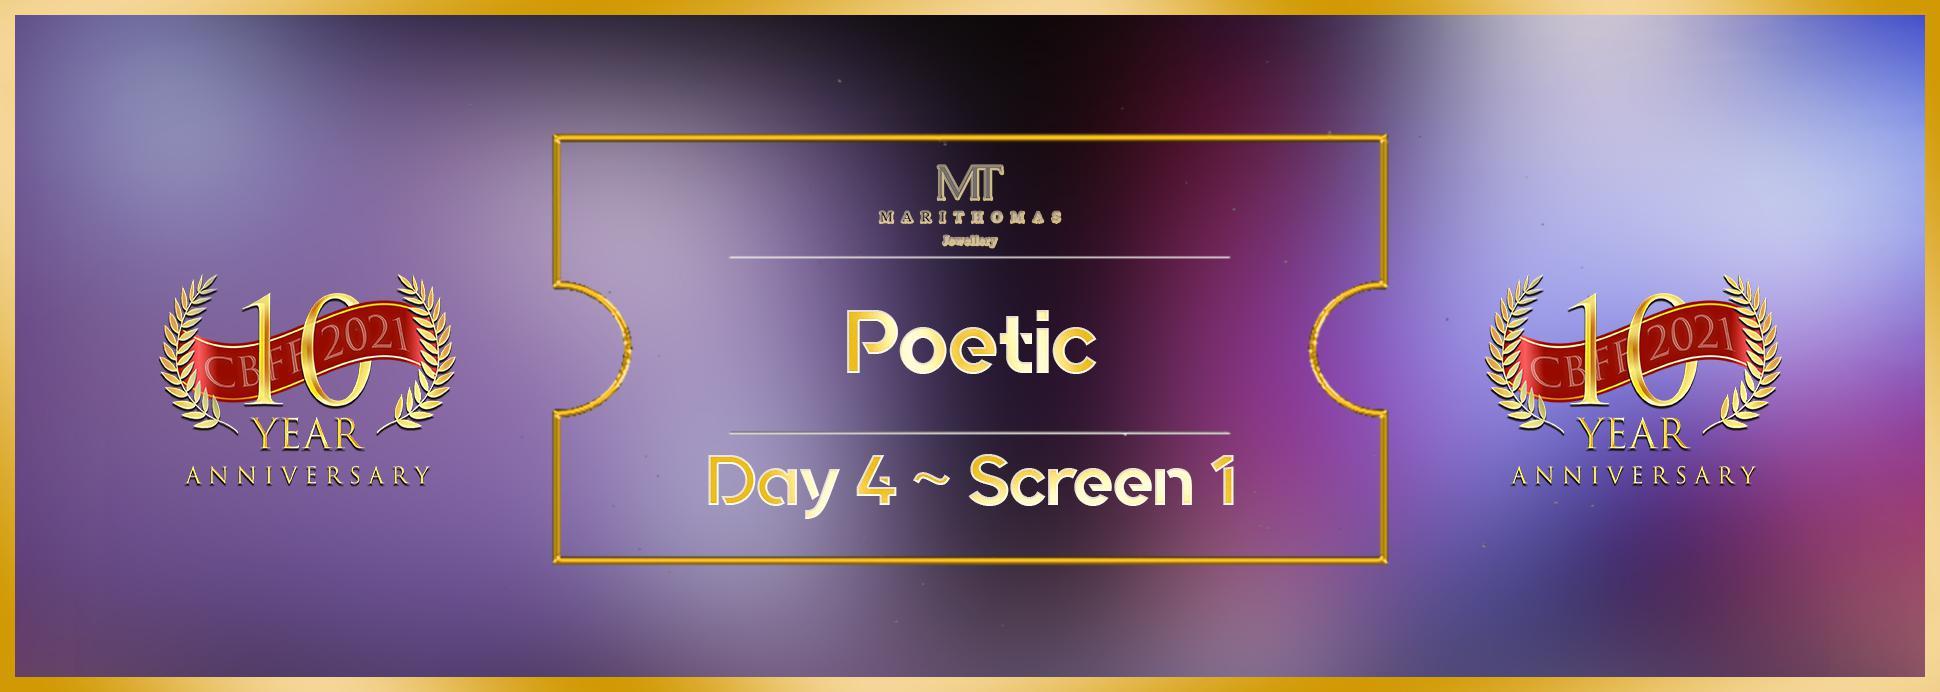 Day 4, Screen 1: Poetic Short Films